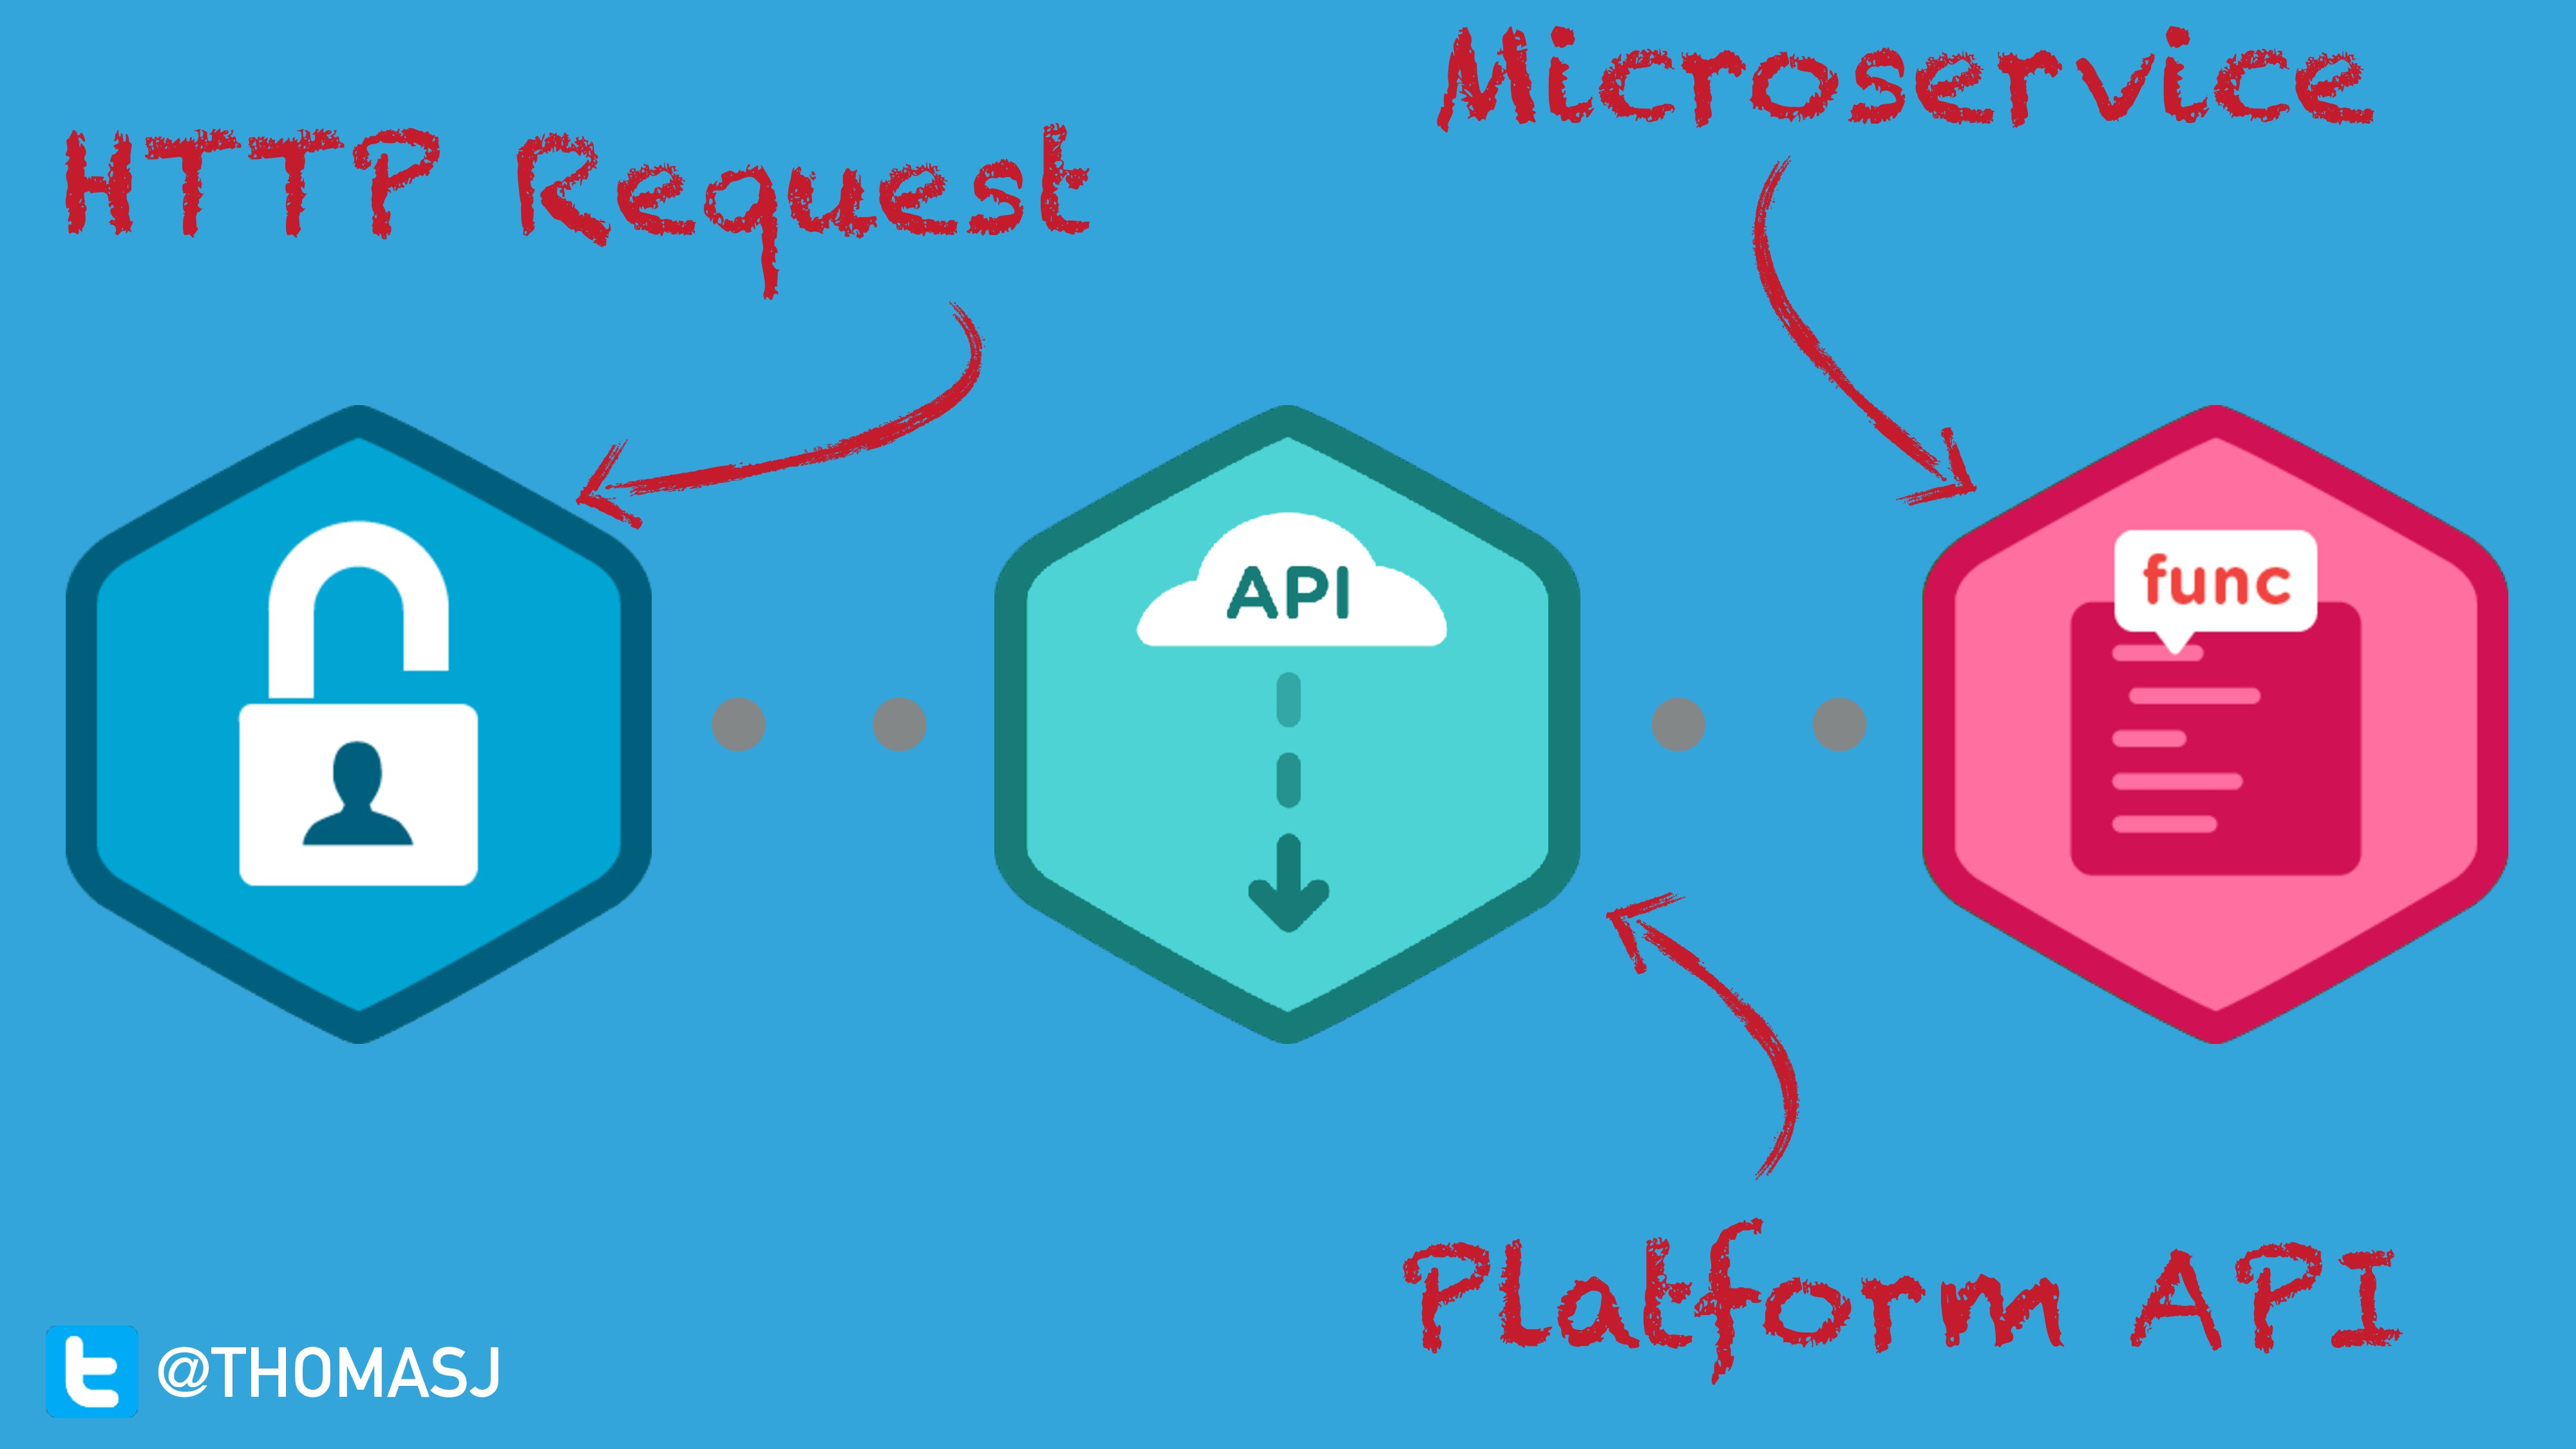 Platform API HTTP Request Microservice @THOMASJ